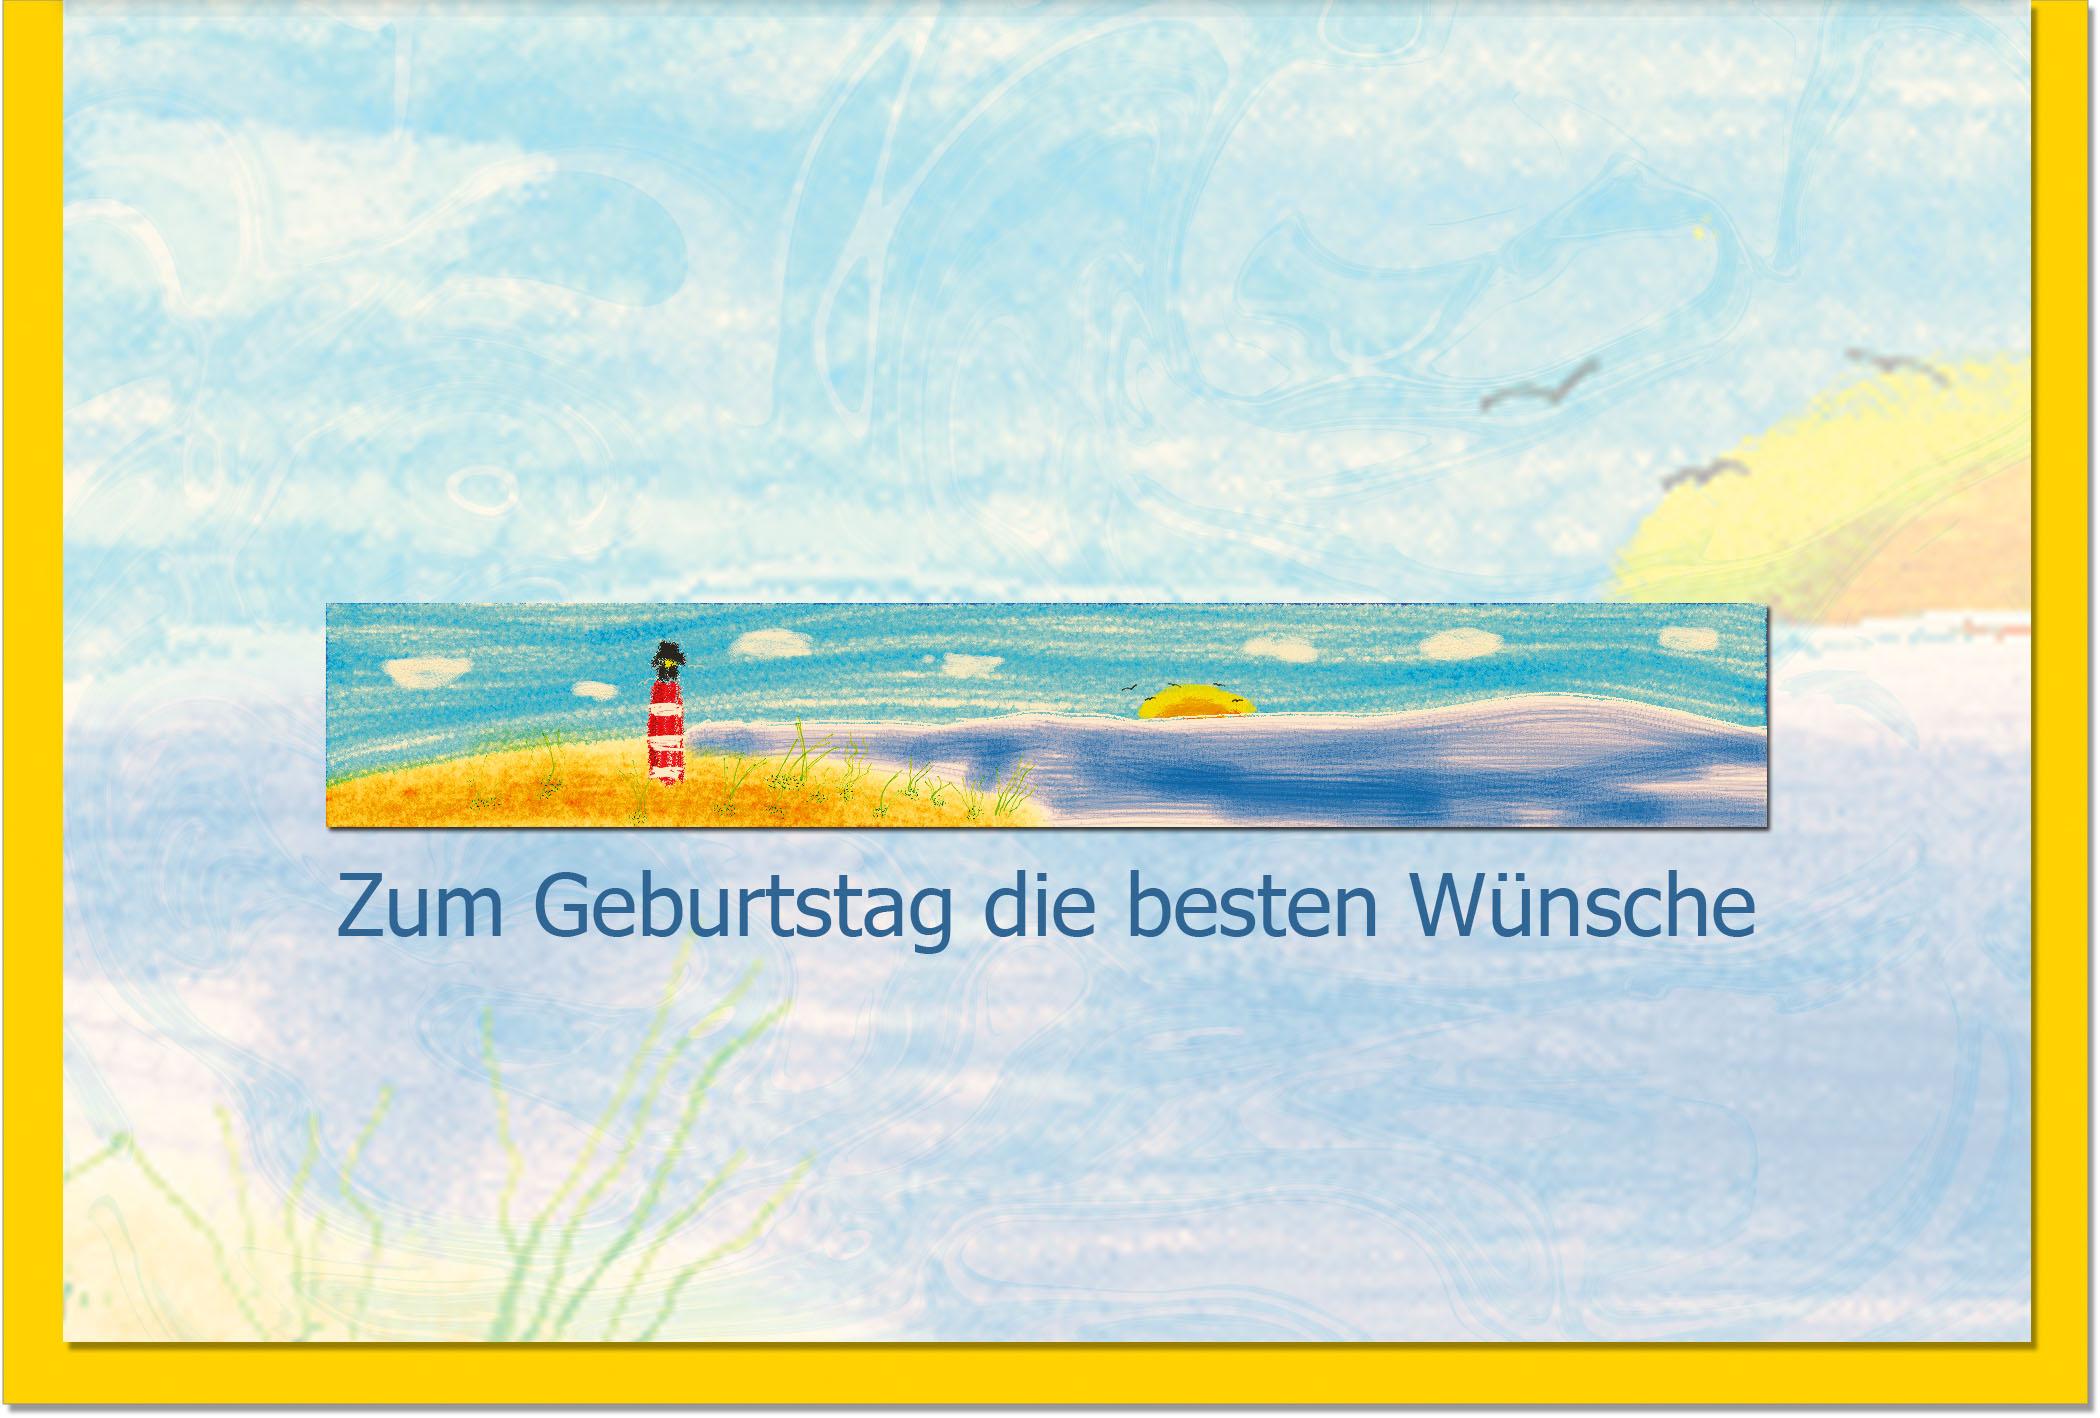 Geburtstagskarten / Grußkarten /Geburtstag Küste